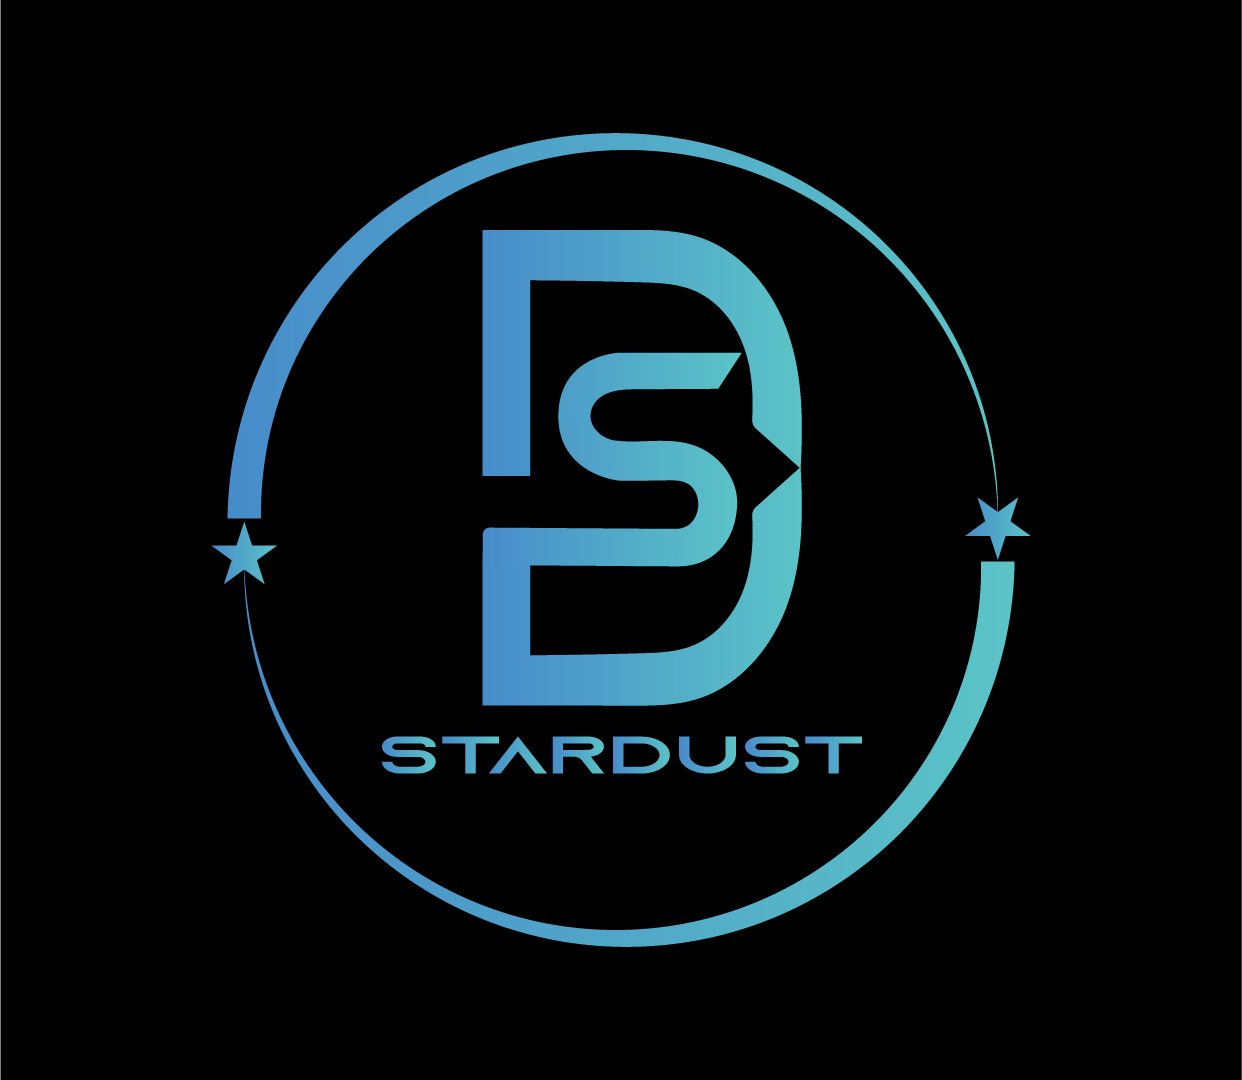 https://solidproof.io/storage/logos/Qs3KIwKURkHZ7Y3bbNHAcOpIda0YU5RakzBM9VSx.png